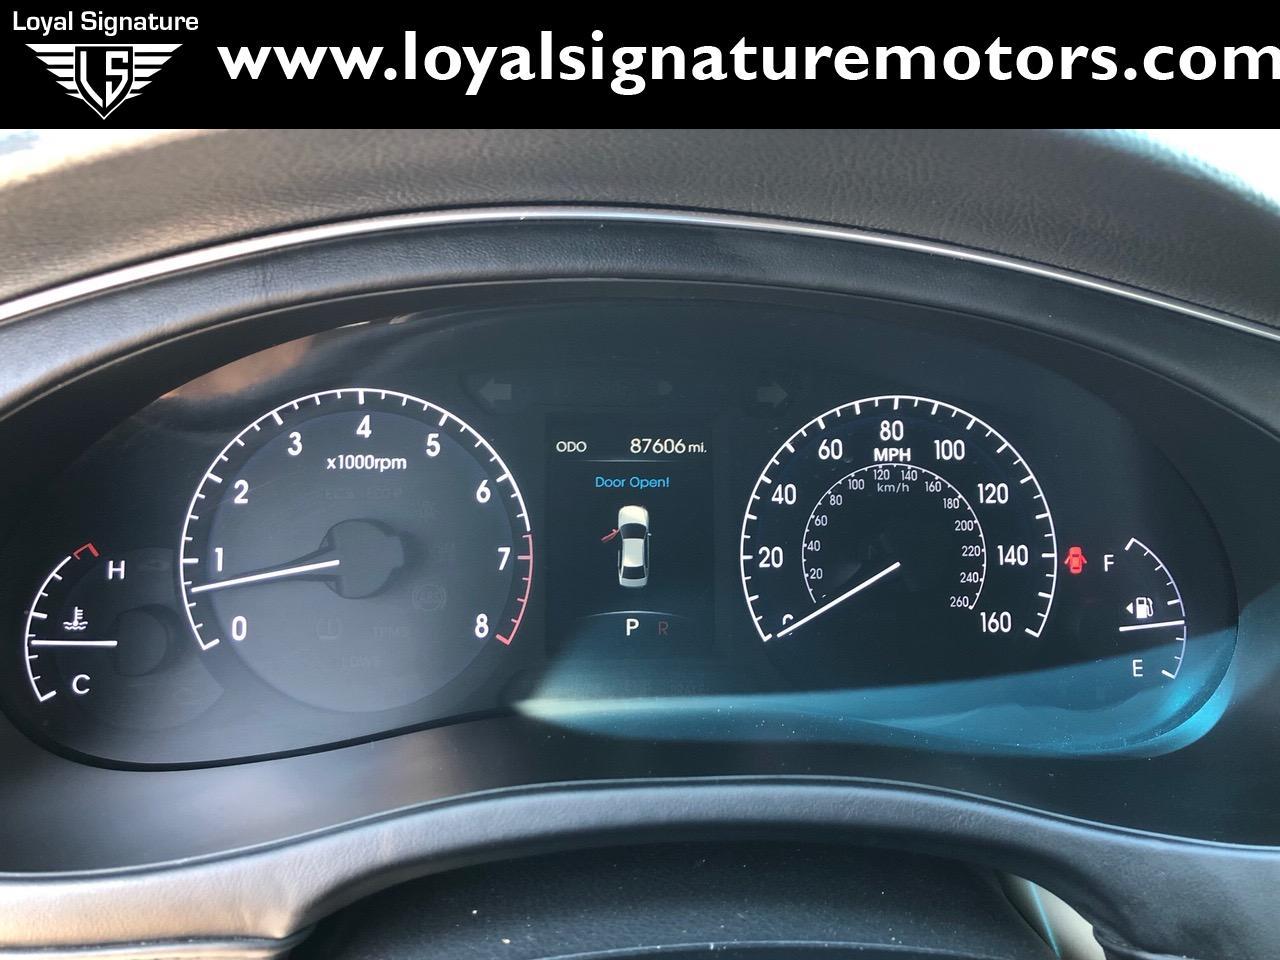 Used-2012-Hyundai-Genesis-50L-R-Spec